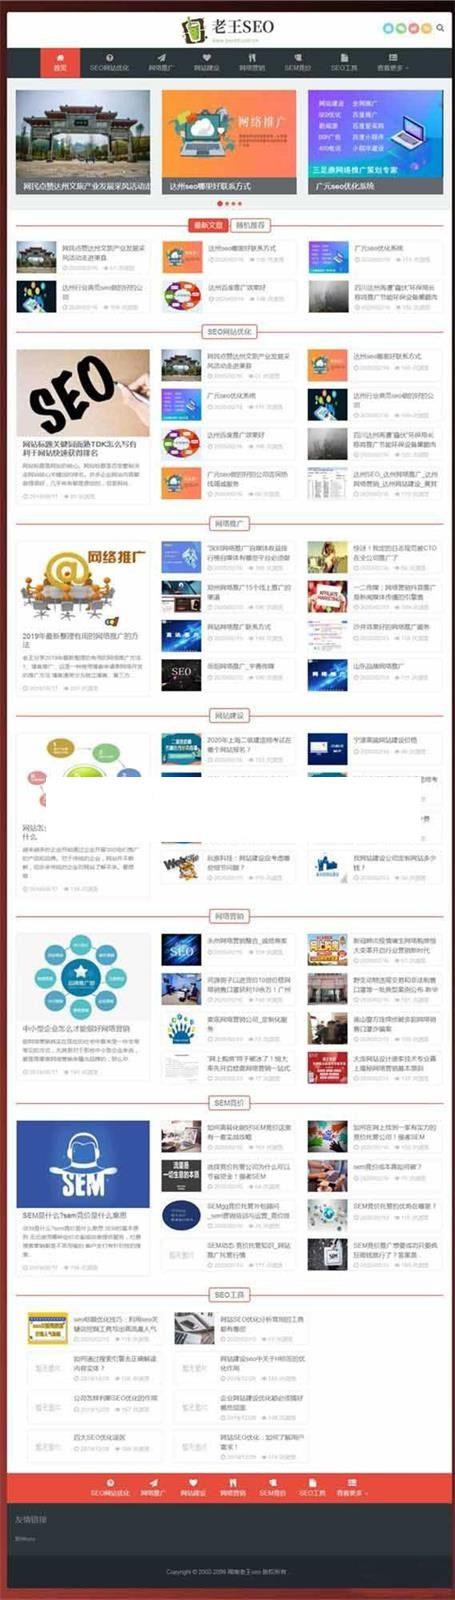 SEO优化技术教程网站源码 自适应手机端 织梦dedecms模板